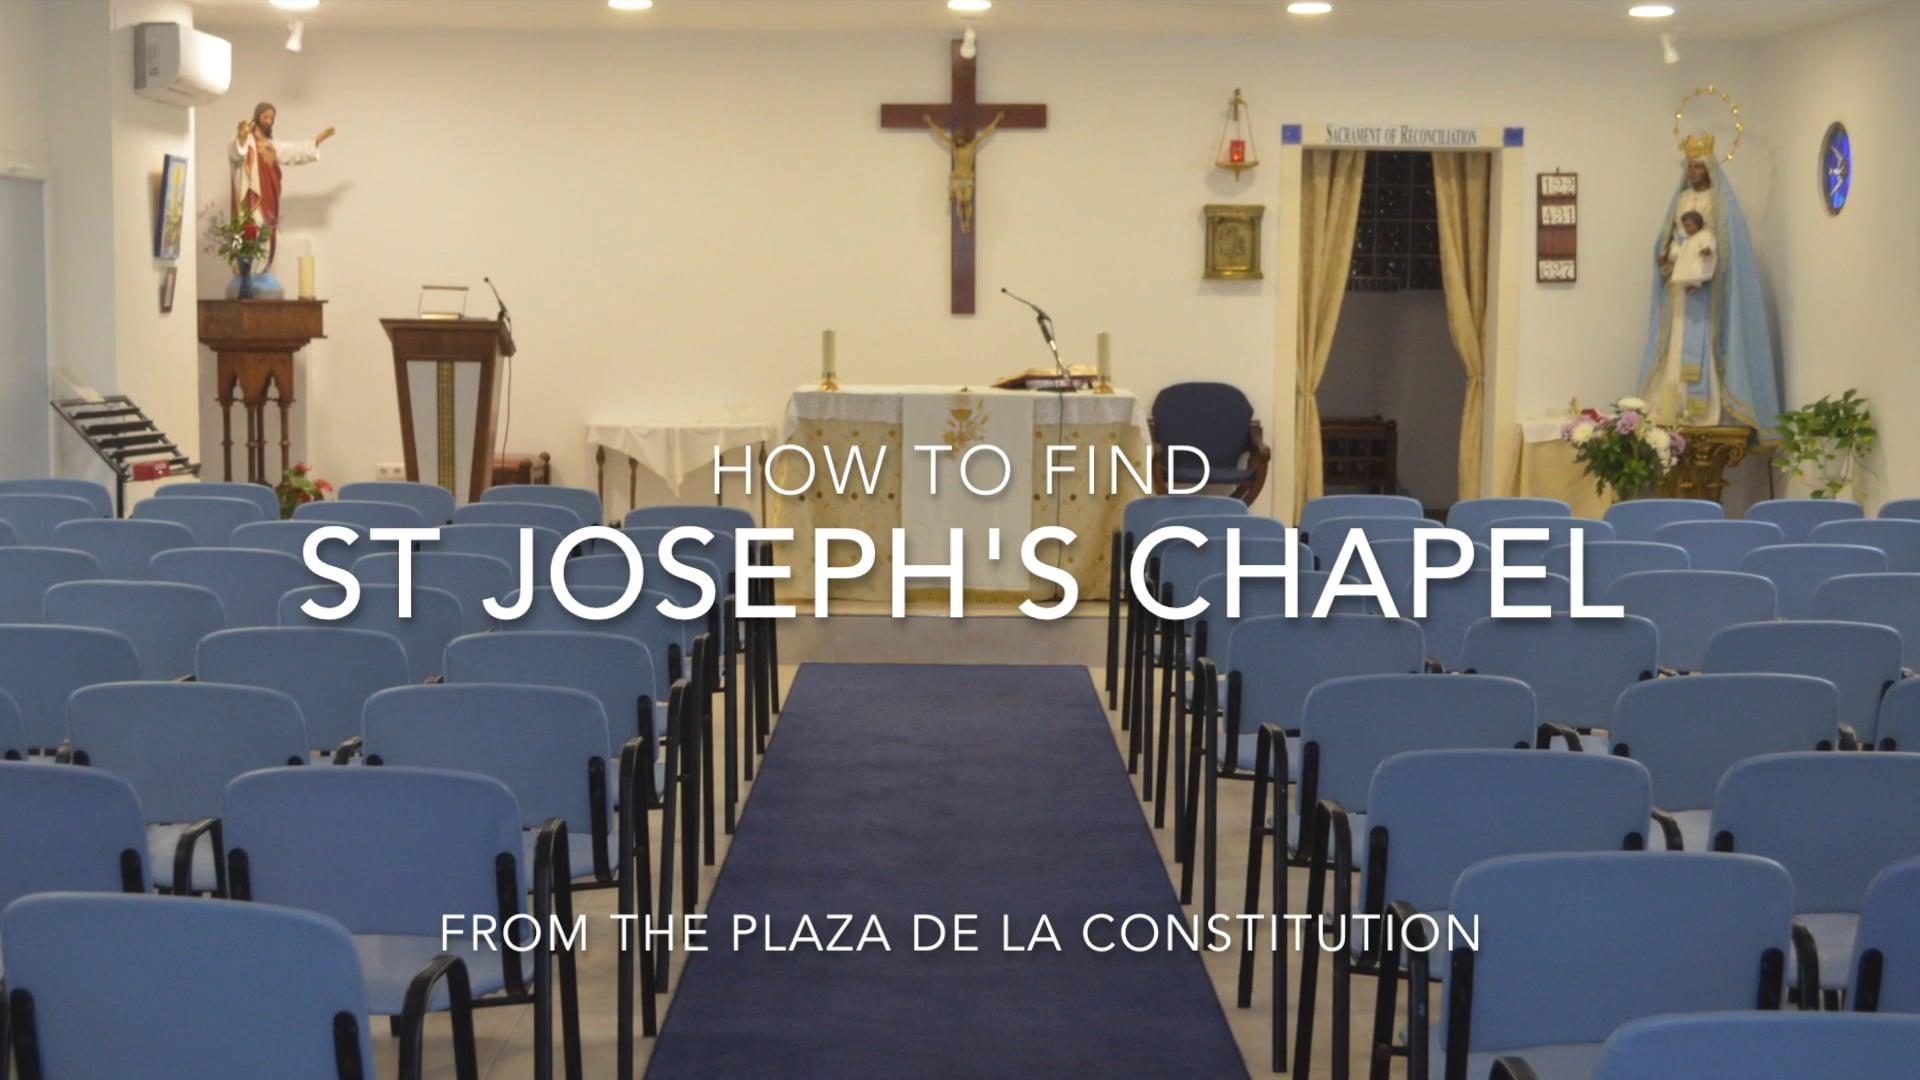 St Josephs from Rosario